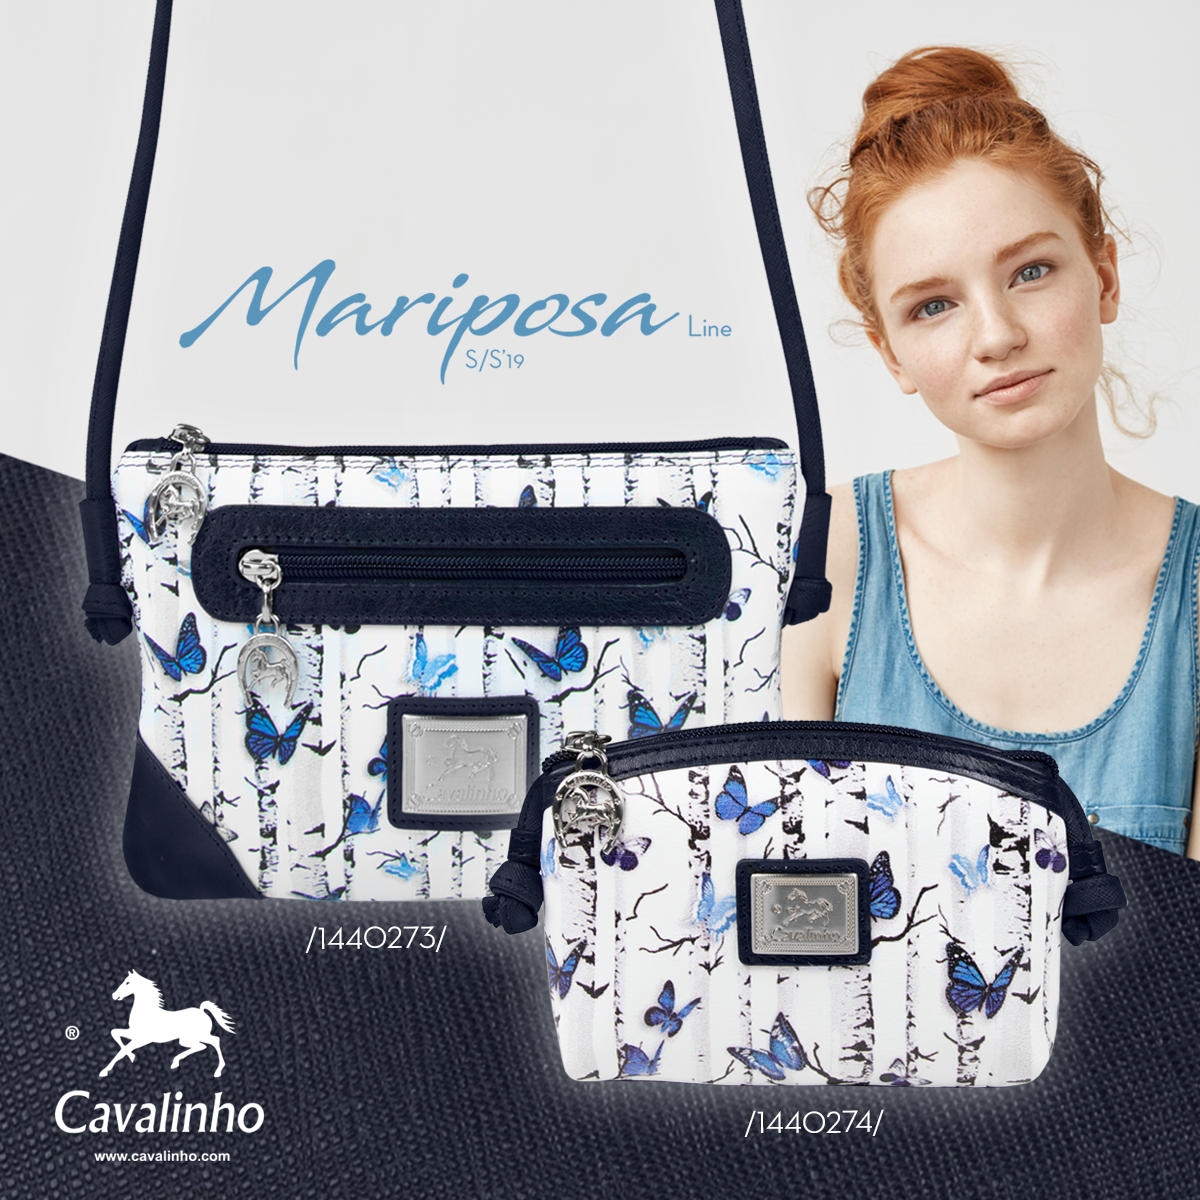 mariposa_post_02